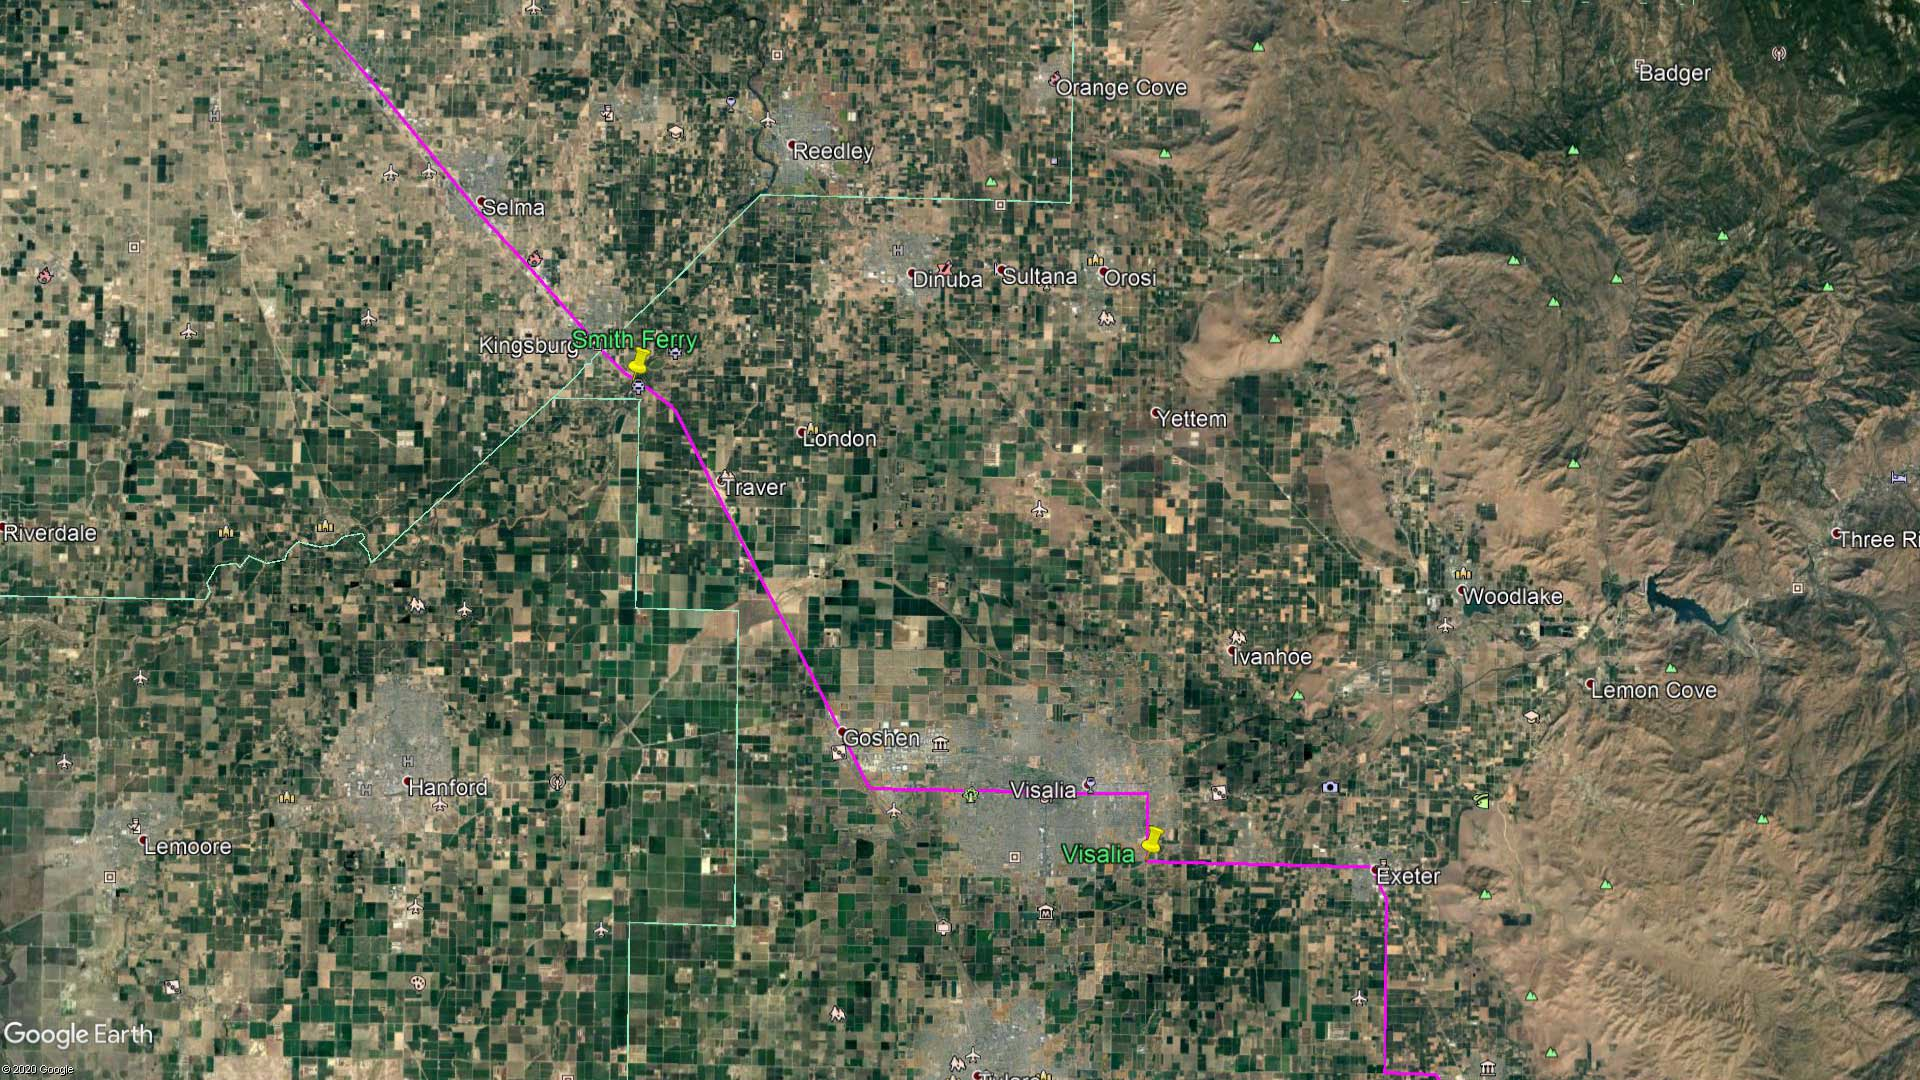 May 16, 1870 - The San Joaquin Valley